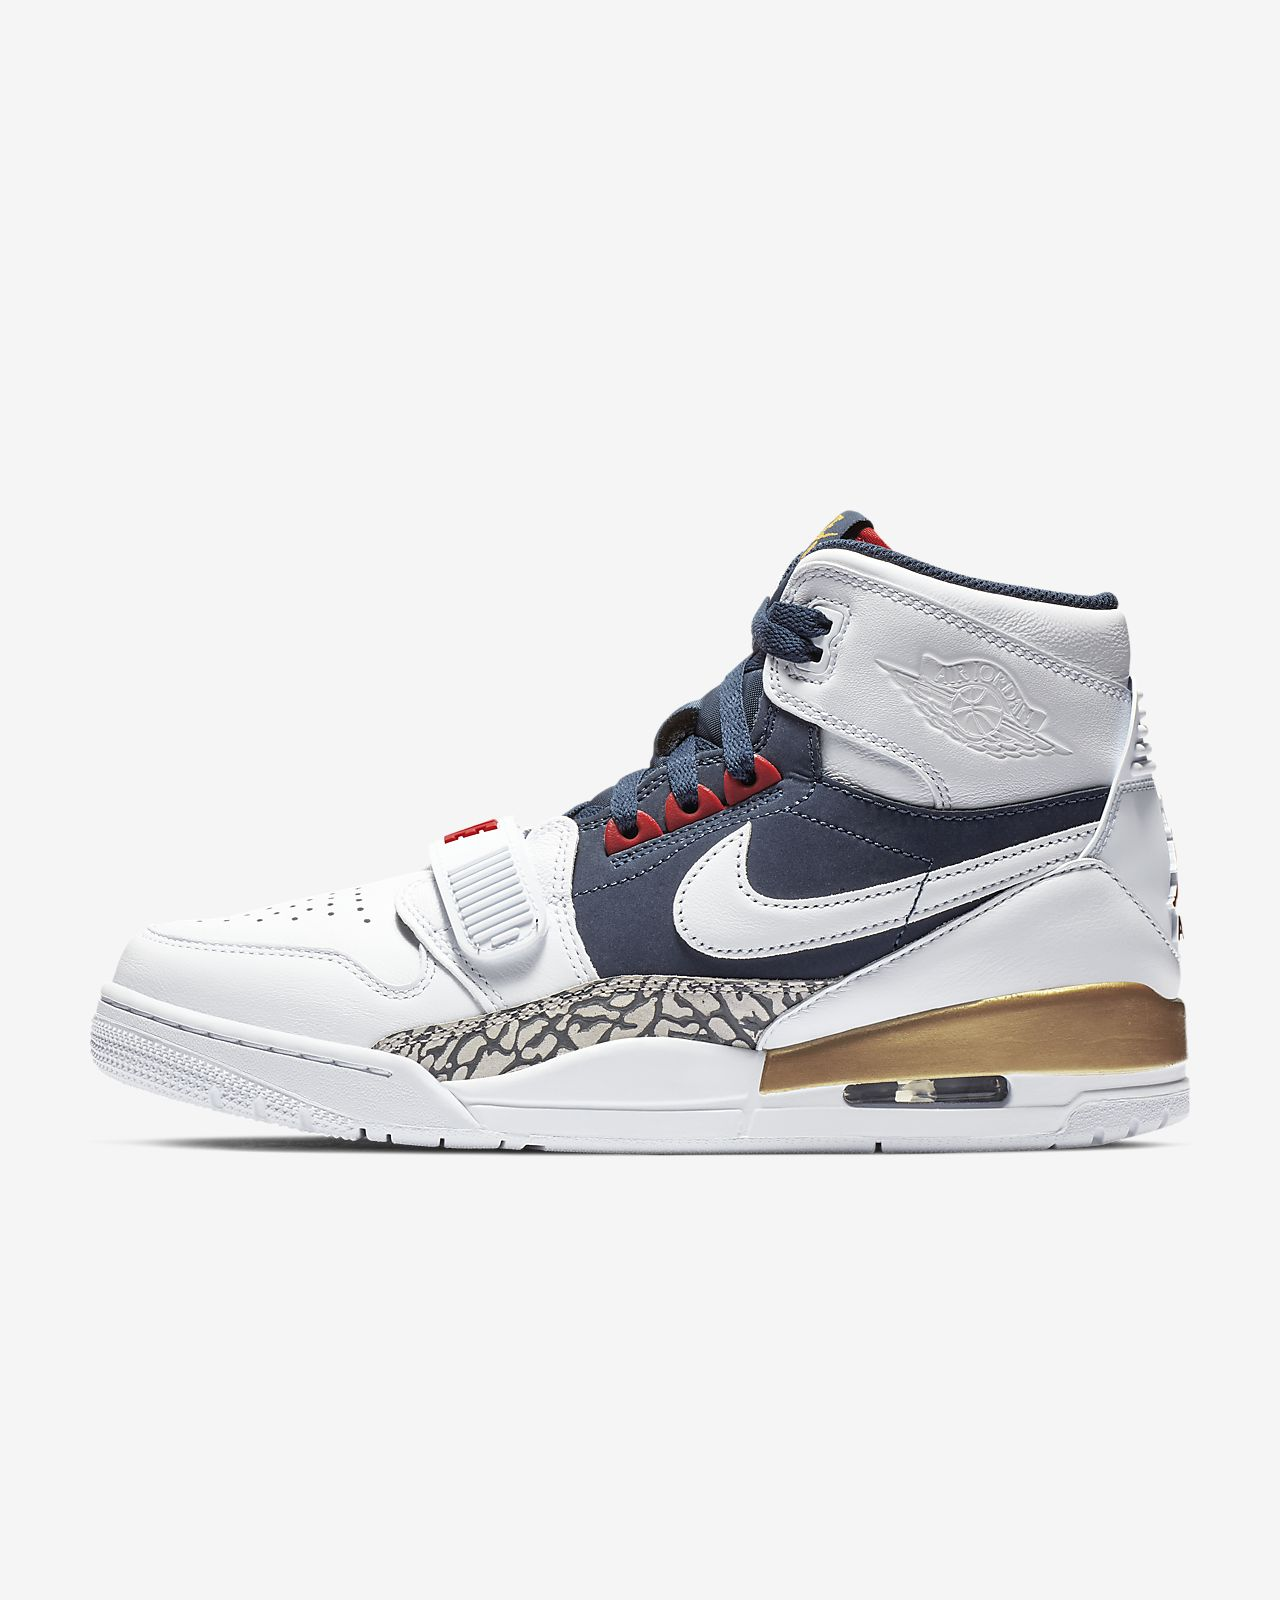 separation shoes 08372 d9b70 Low Resolution Air Jordan Legacy 312-sko til mænd Air Jordan Legacy 312-sko  til mænd